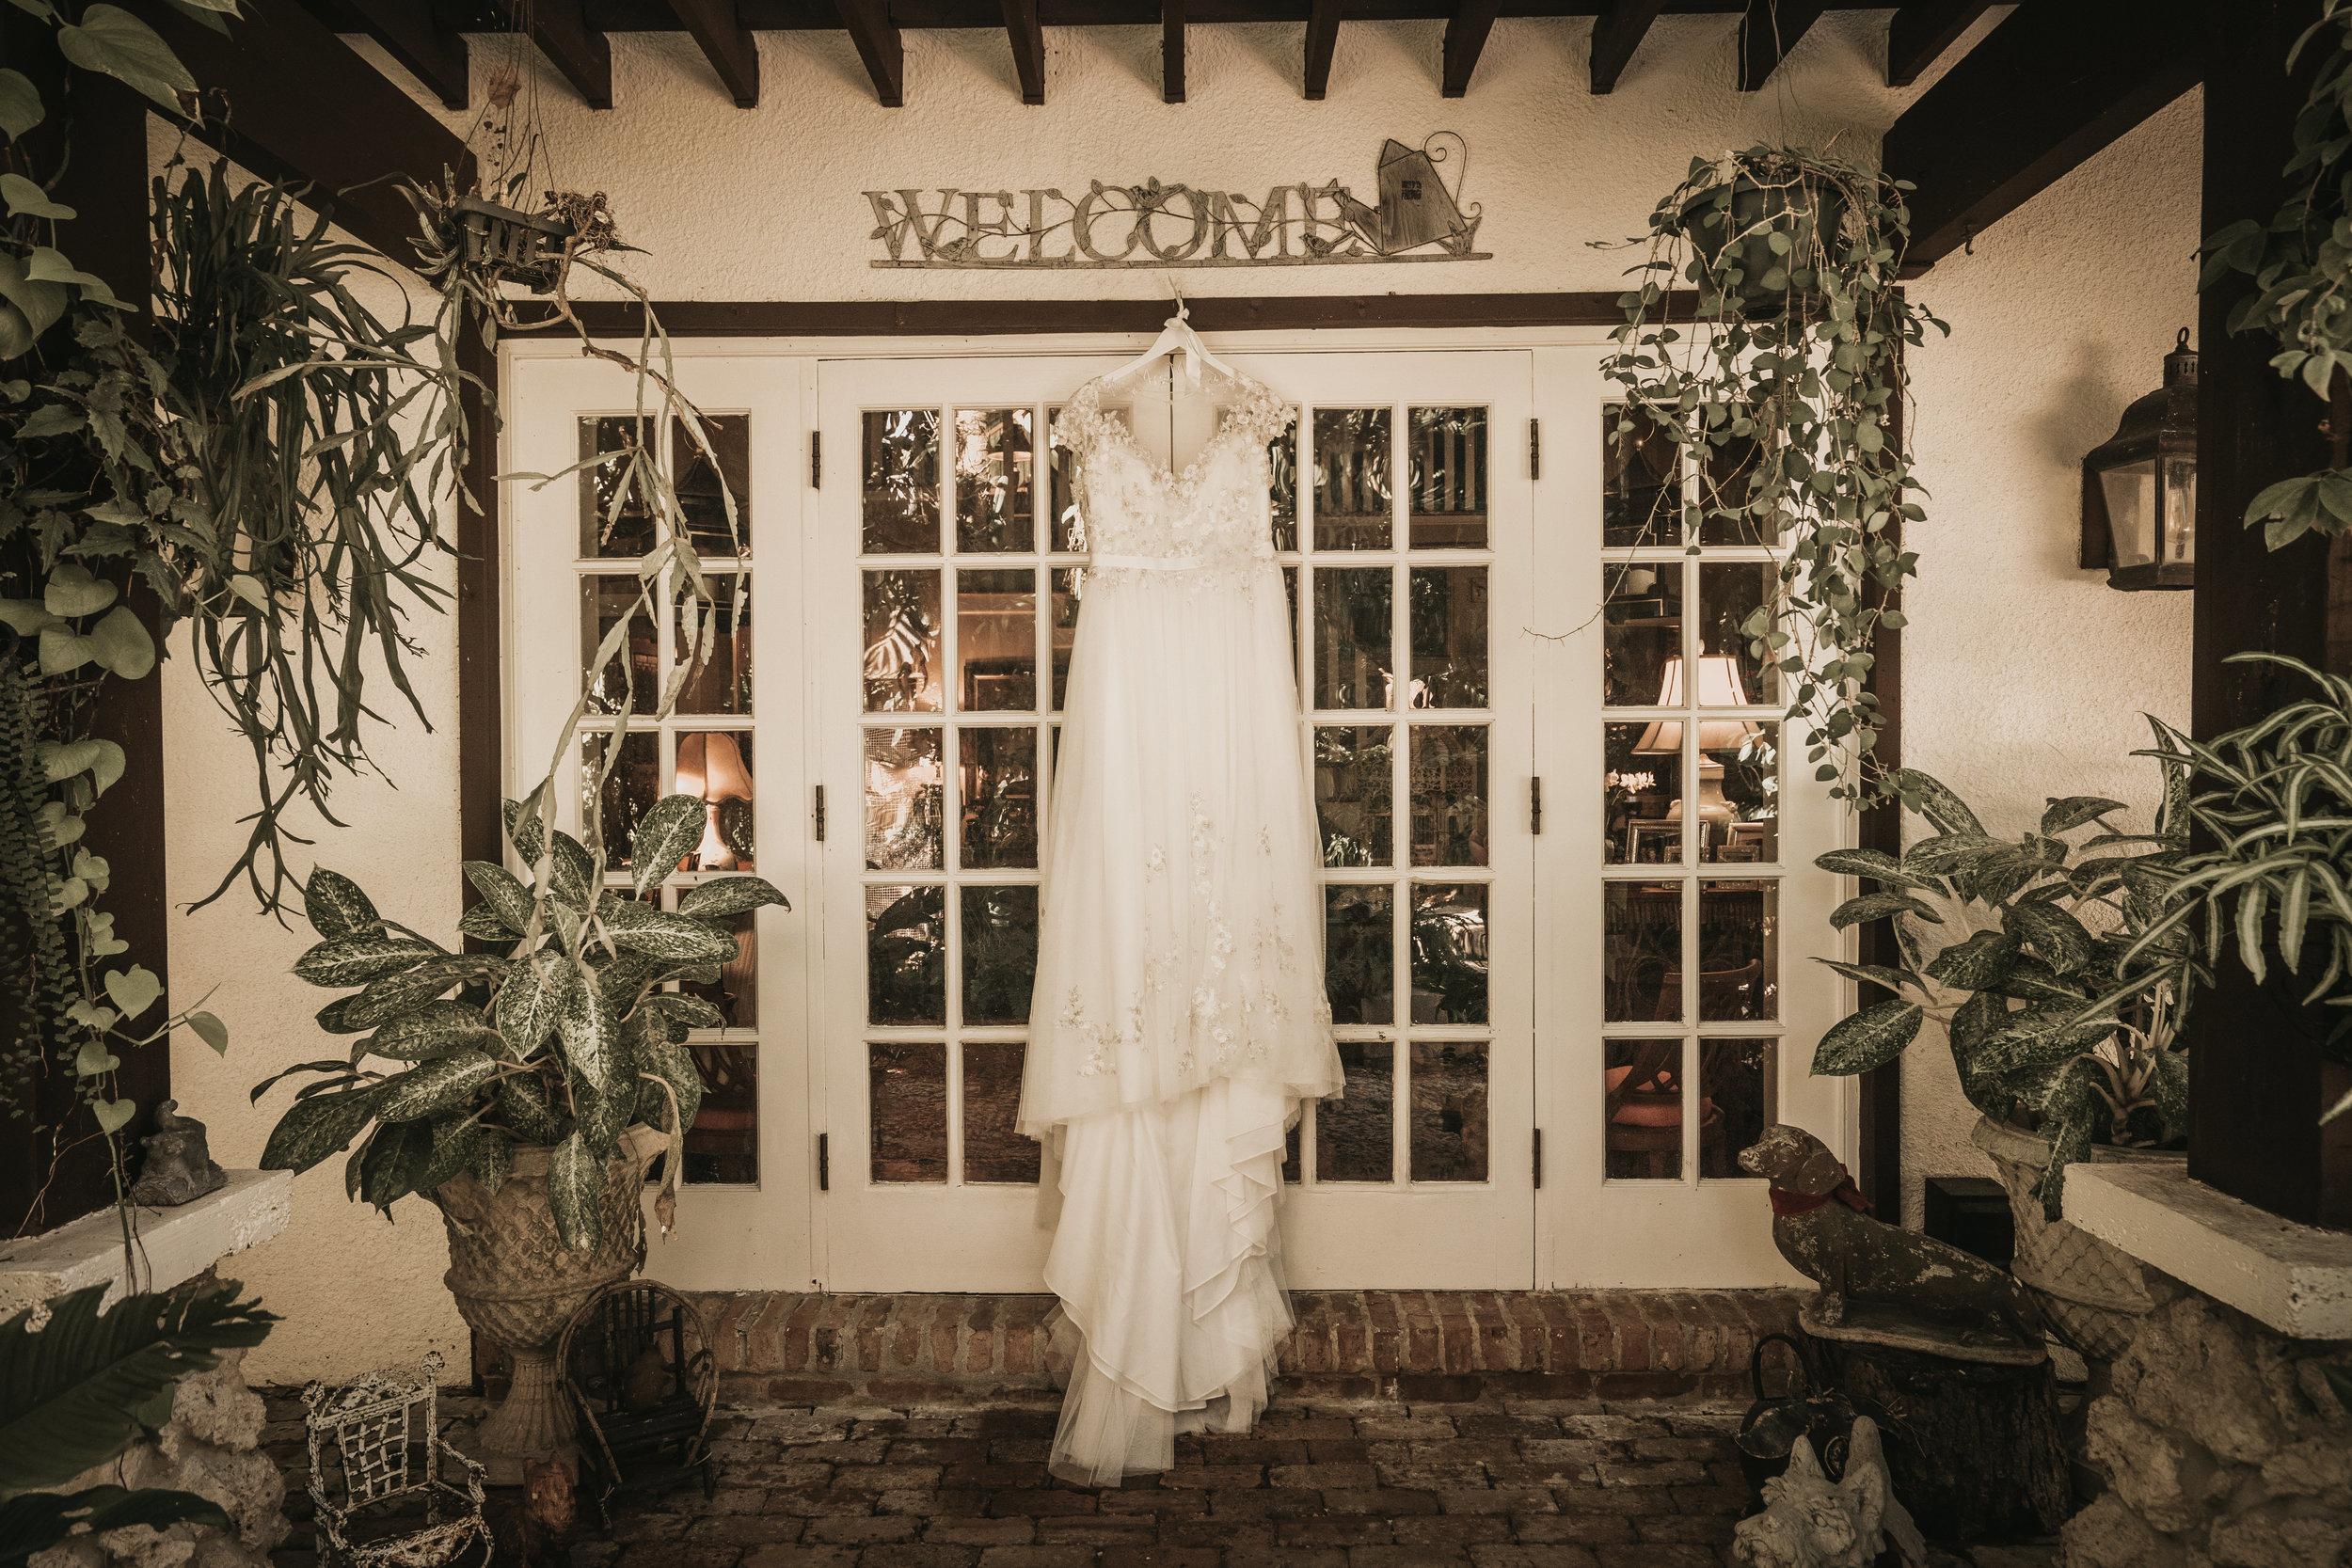 137MICHI&GABEWEDDINGDAY(WeddingFinal).jpg